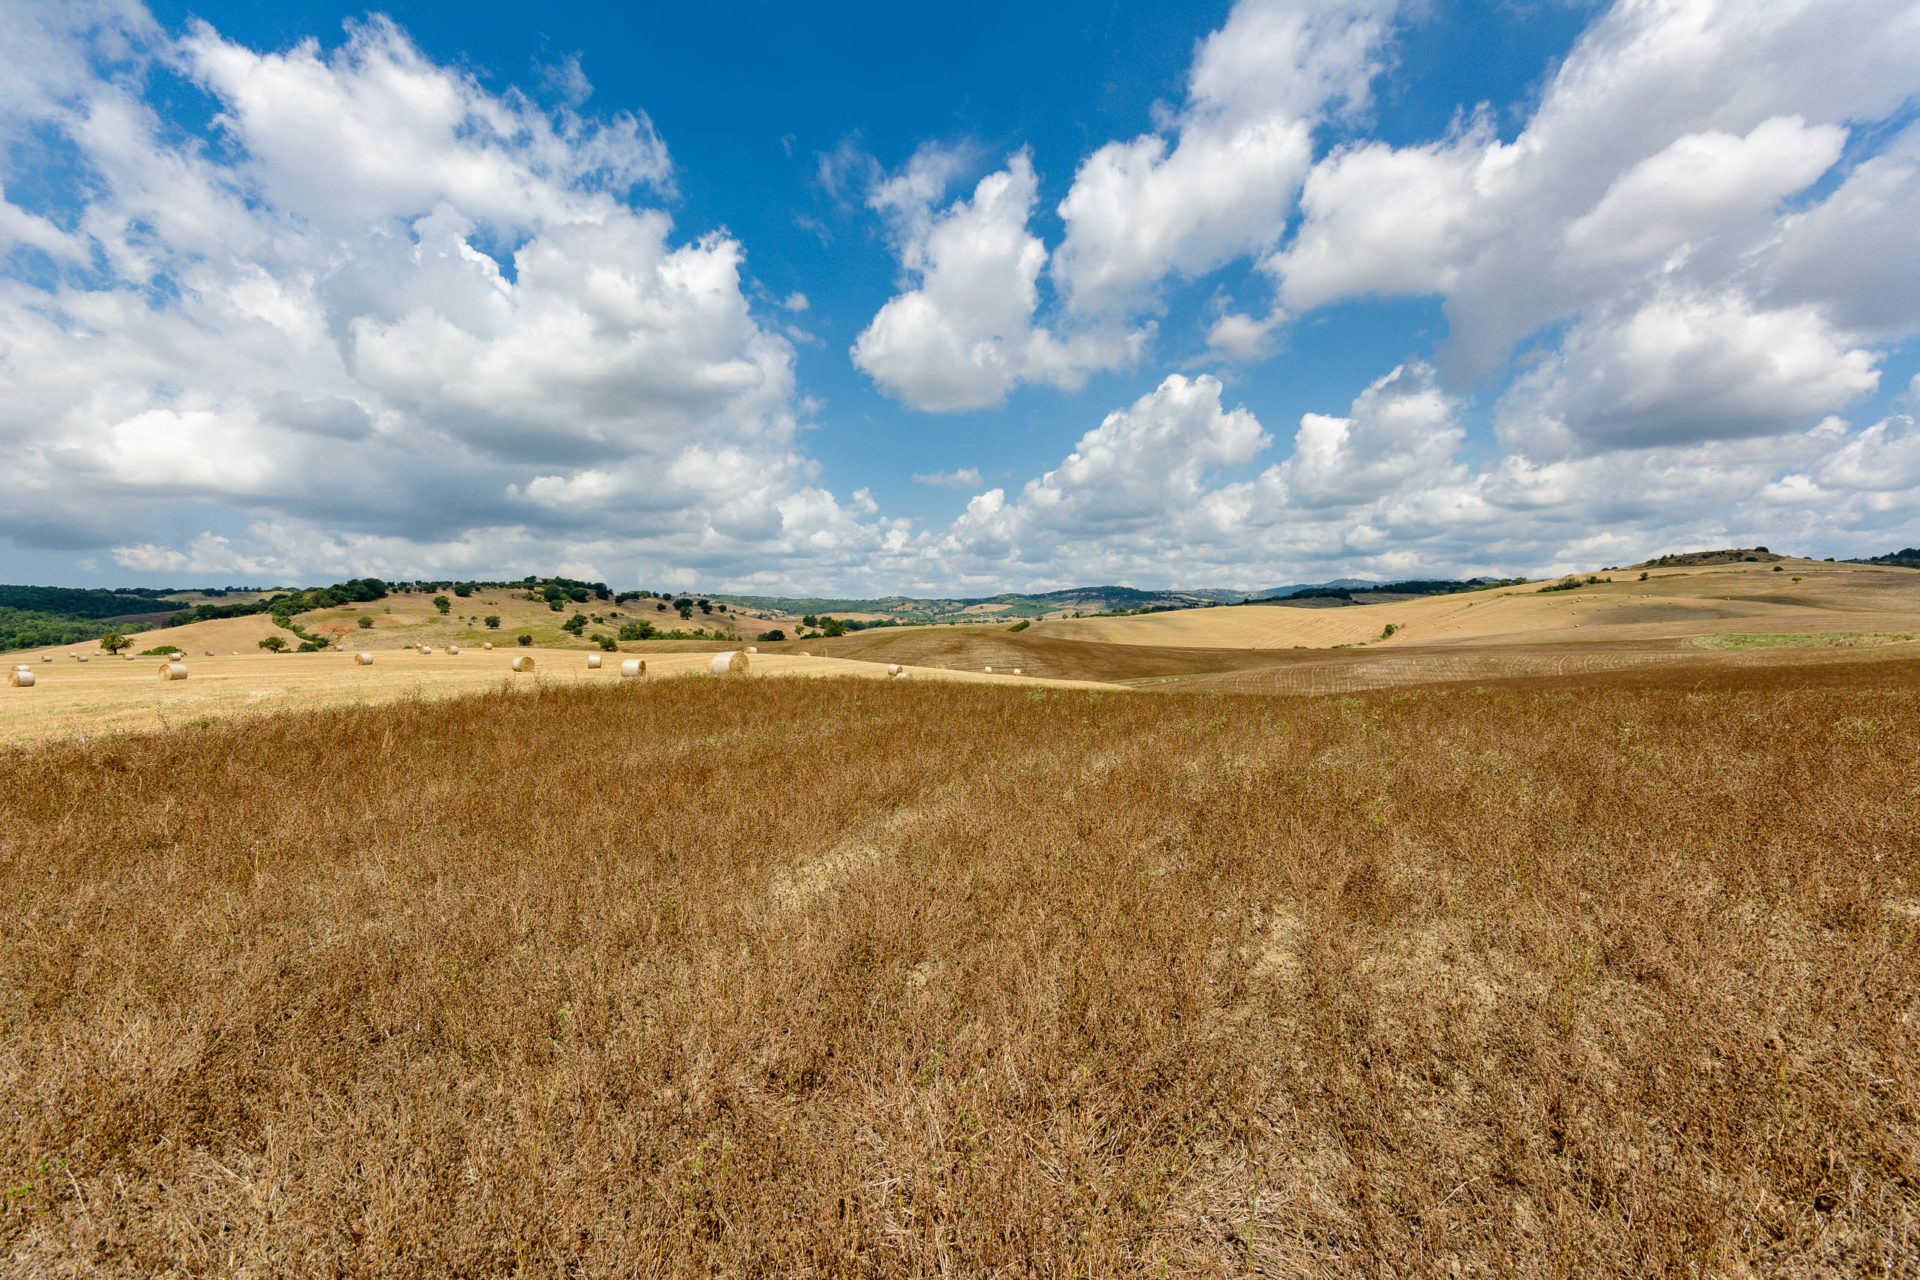 Toskana,sommer,feld,getreide,ernte,maremma,landschaft